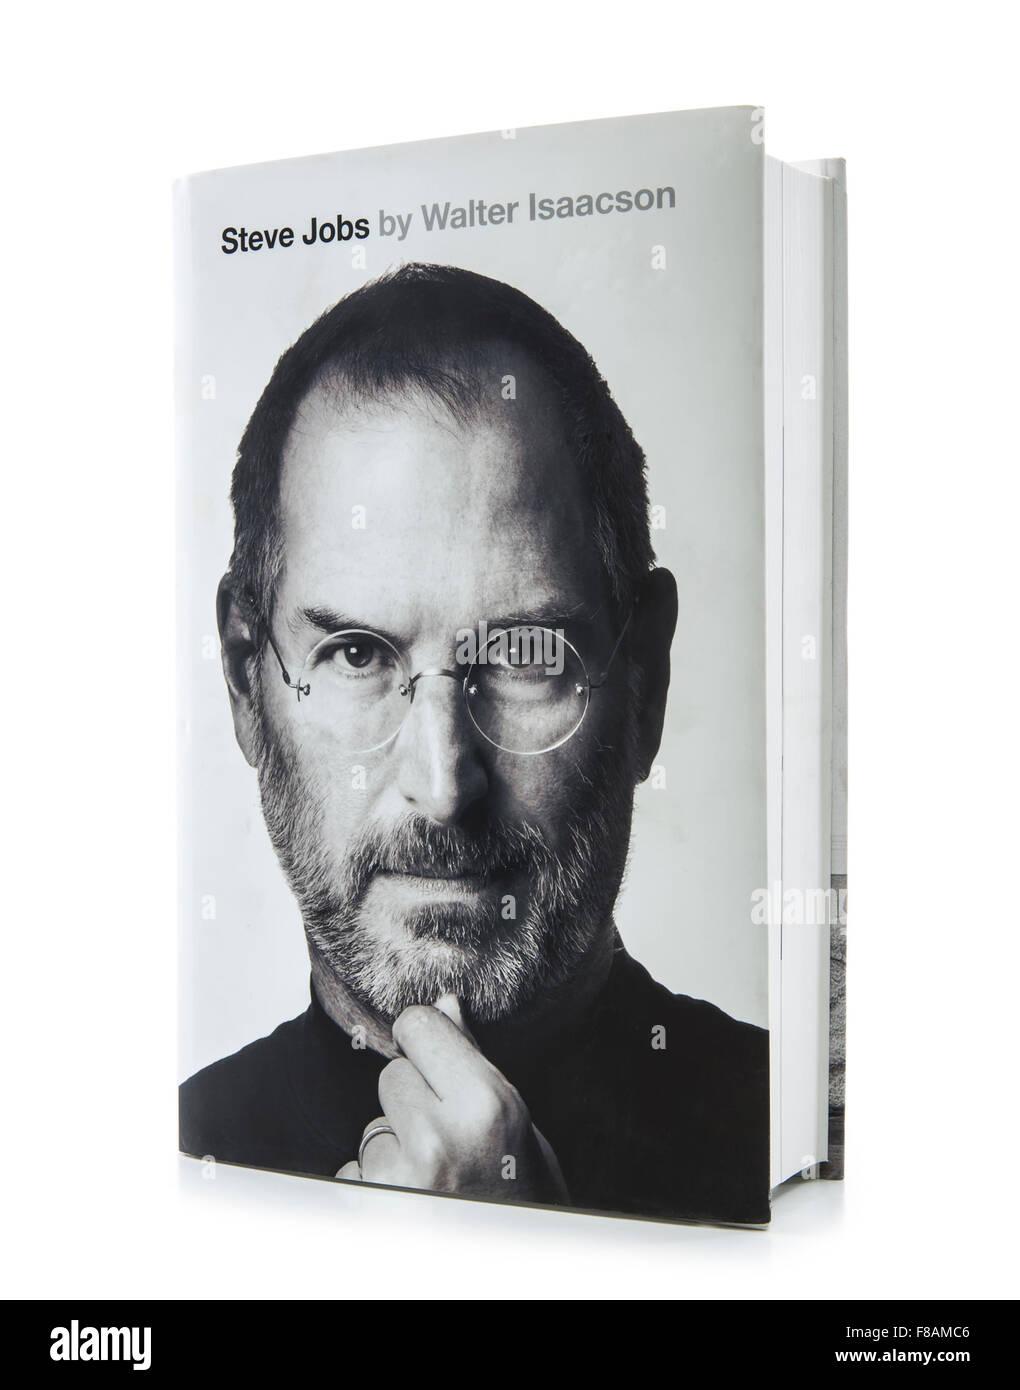 860b40b23e2 Steve Jobs Biografia di Walter Isaacson Foto & Immagine Stock ...